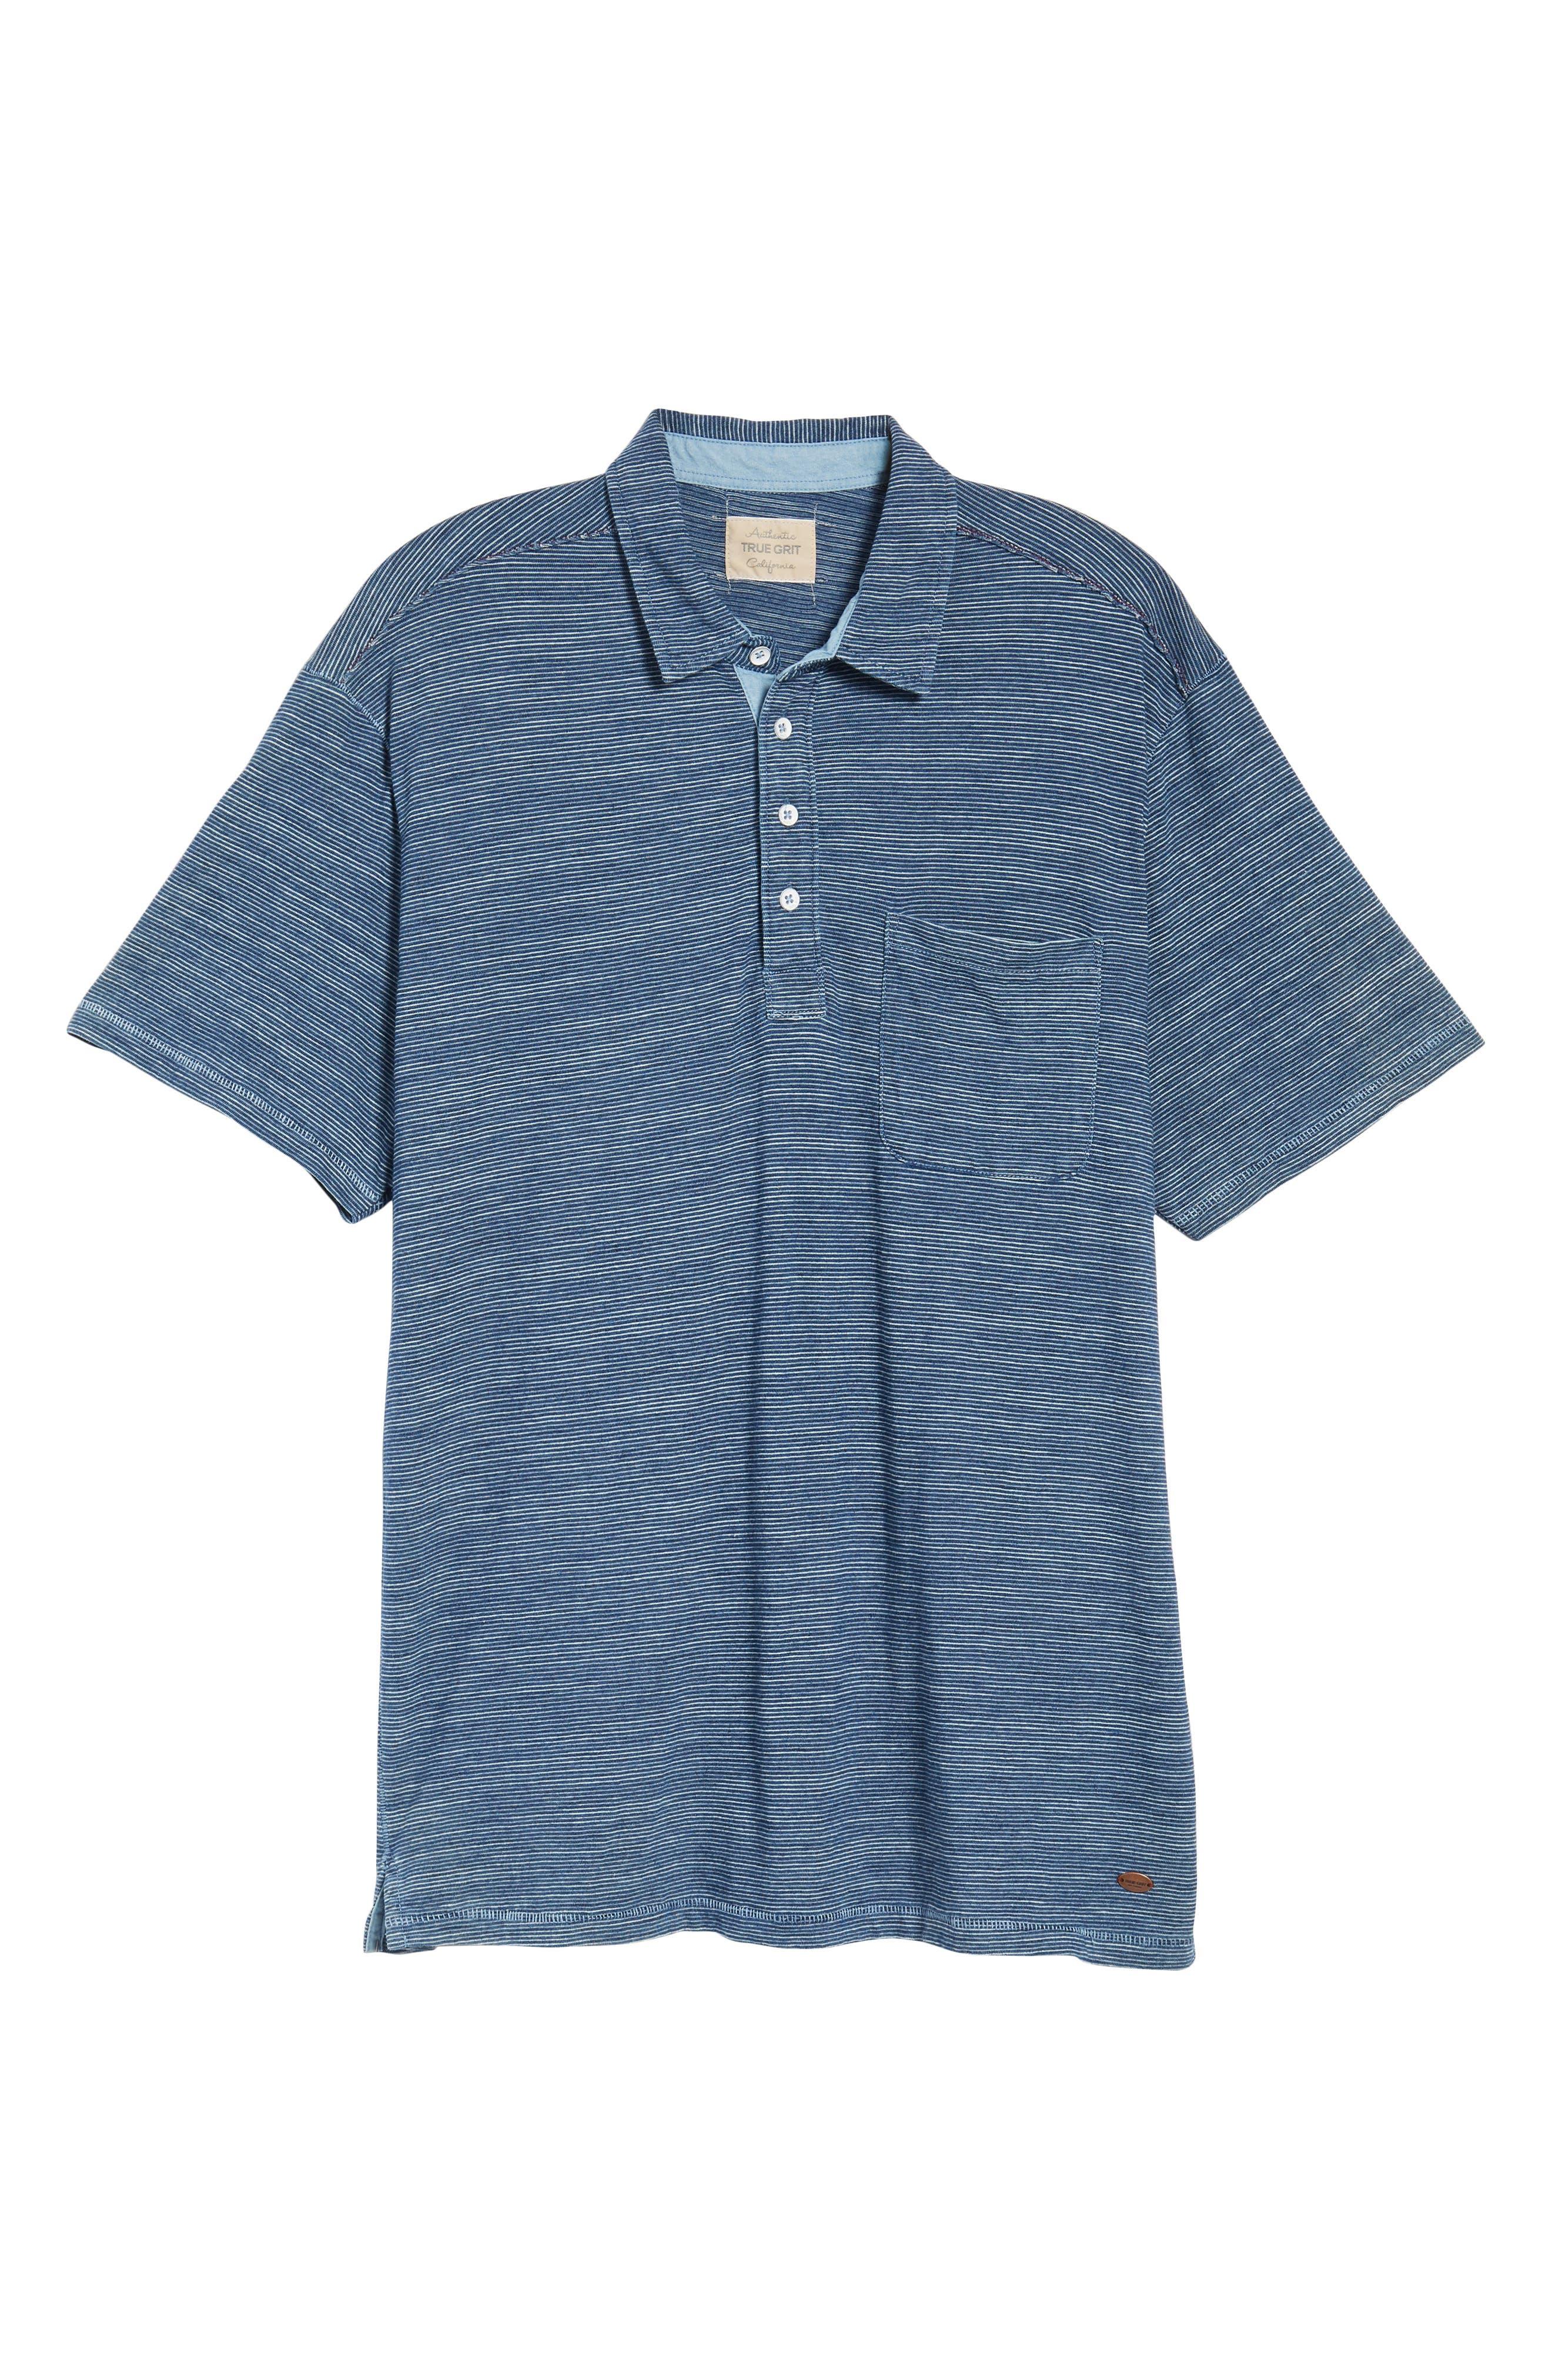 TRUE GRIT,                             Indigo Stripe Jersey Polo,                             Alternate thumbnail 6, color,                             400